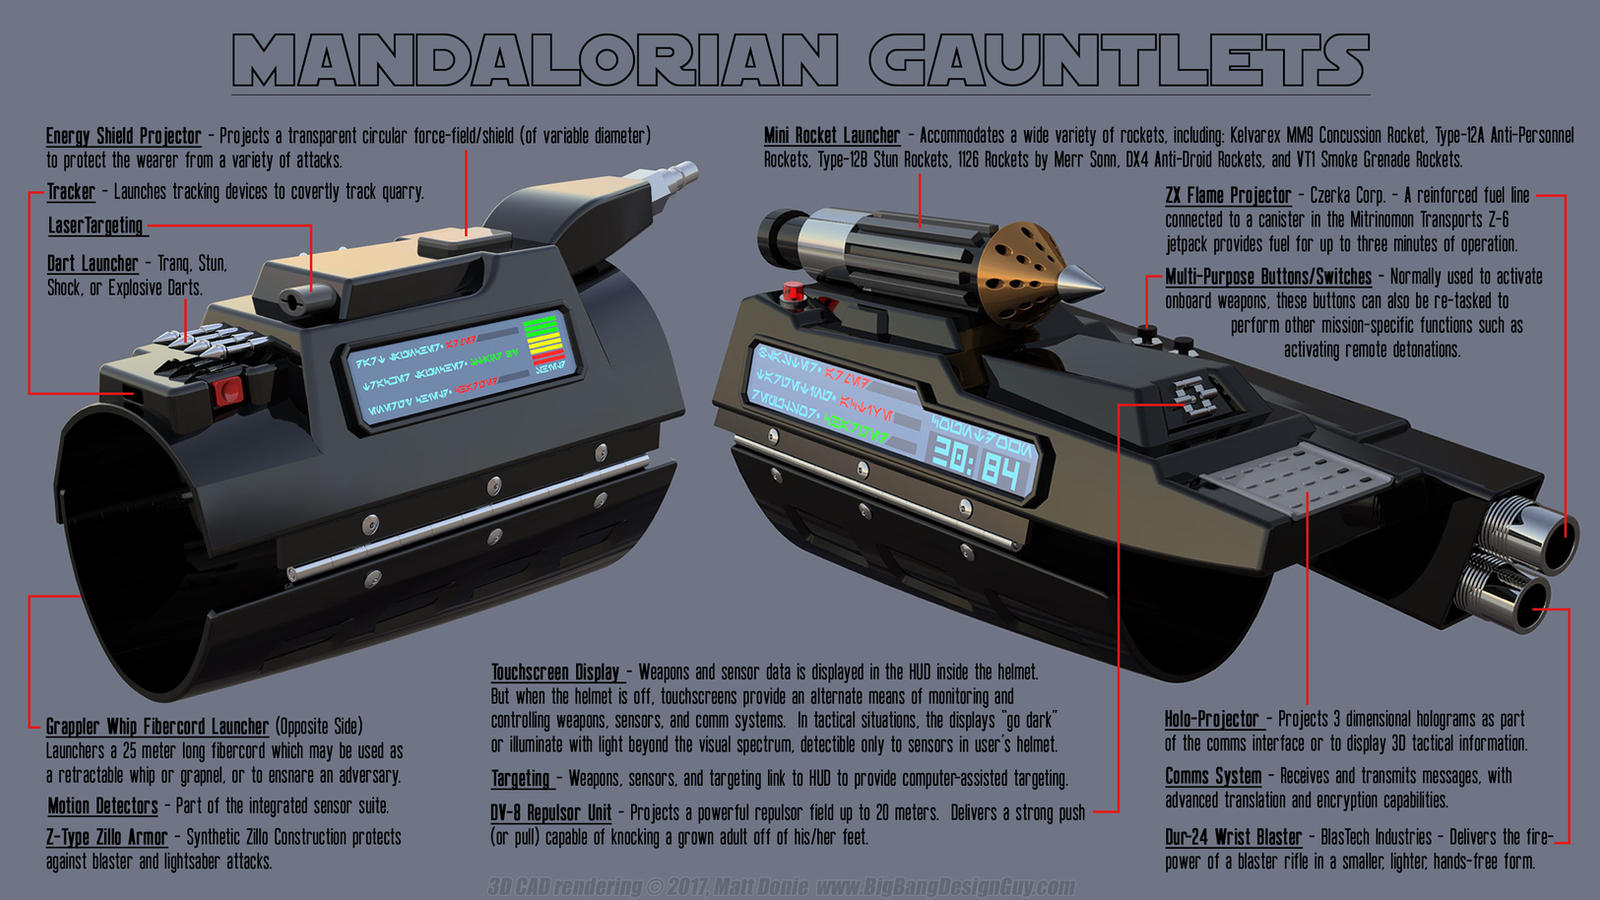 Mandalorian Gauntlet Vambrace Features By Ravendeviant On Deviantart